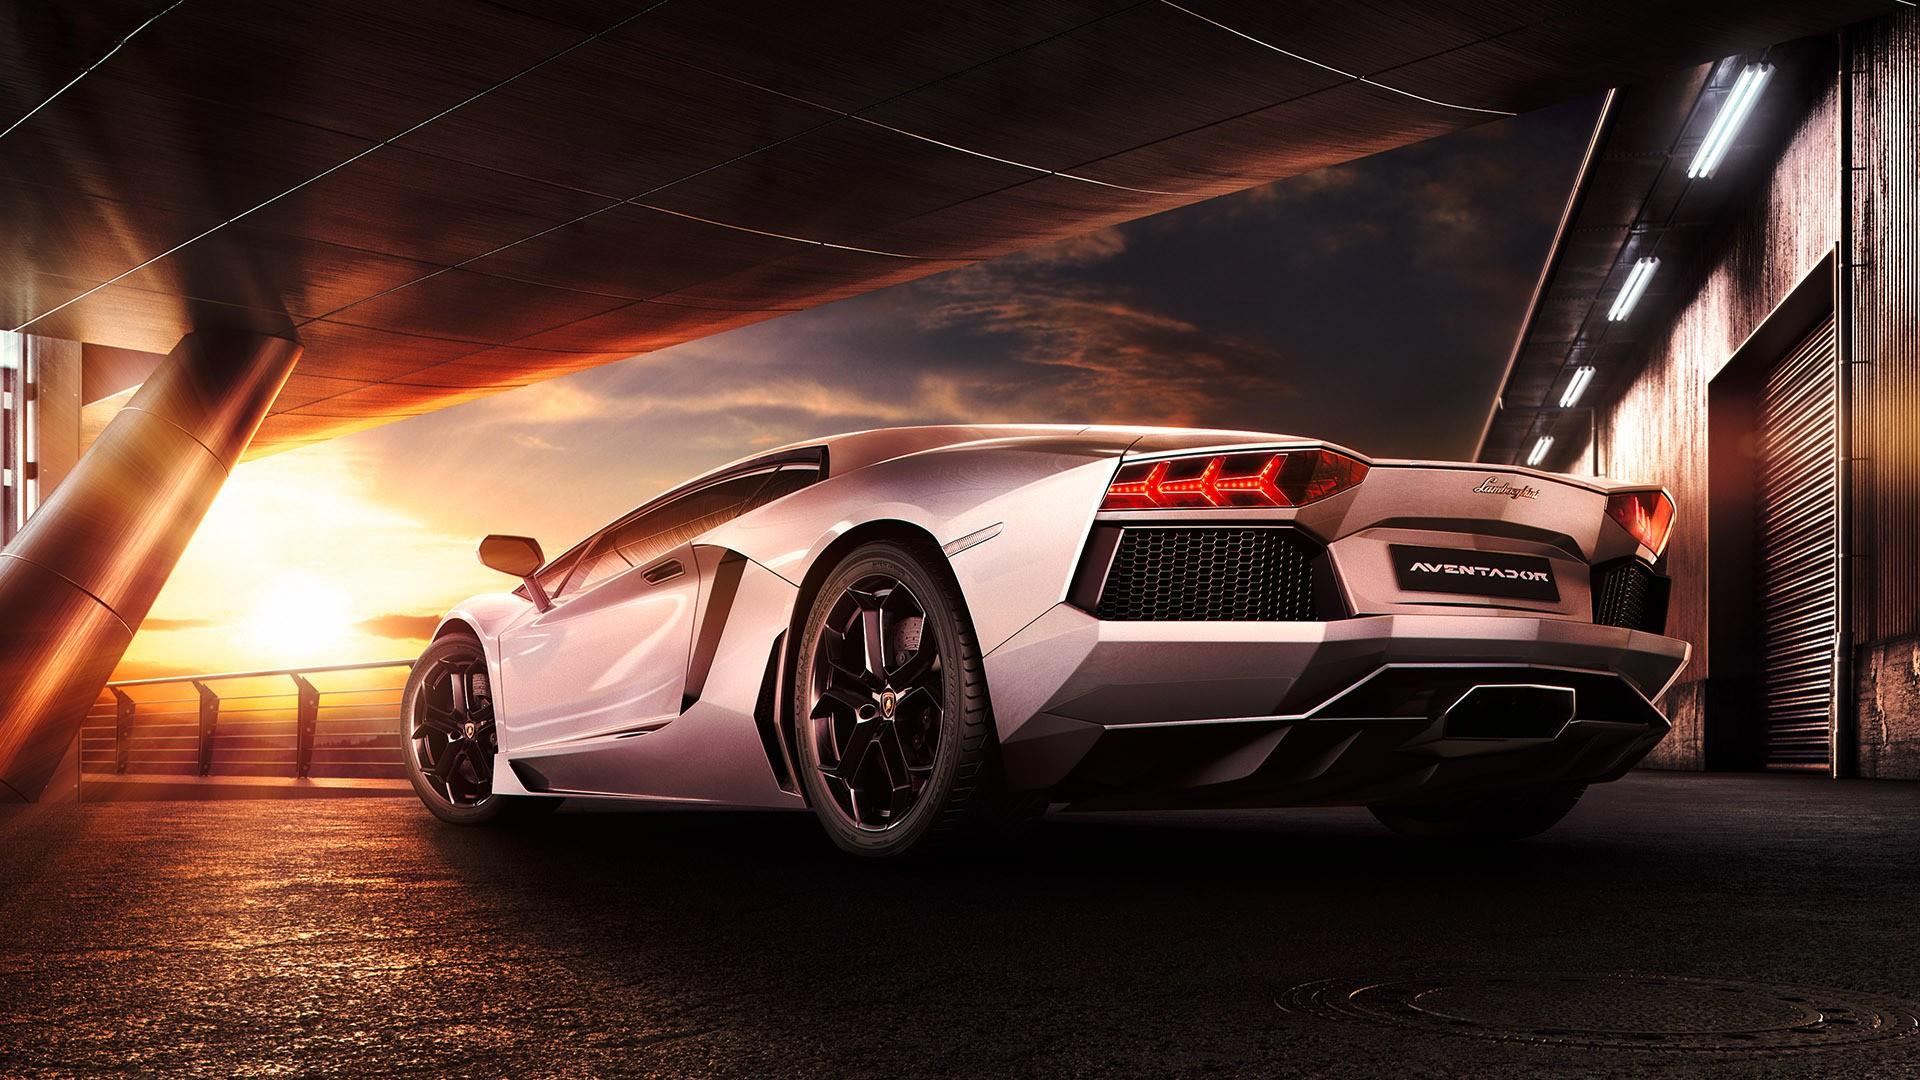 Lamborghini aventador lp700 4 10 wallpaper hd car - Cars hd wallpapers for laptop ...